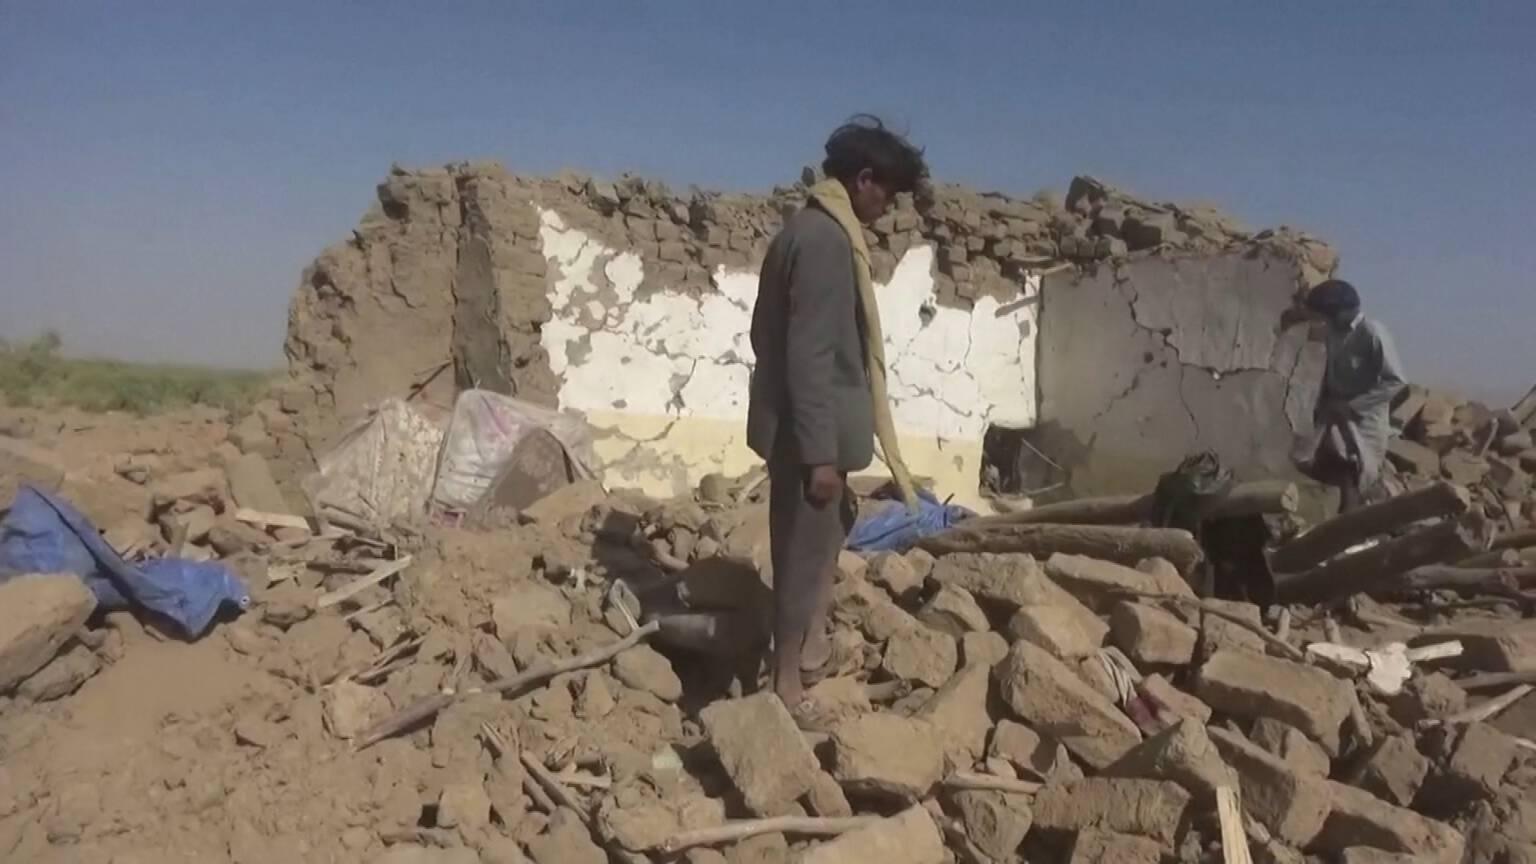 Homes of Yemenis killed by Saudi warplanes, Reuters photo